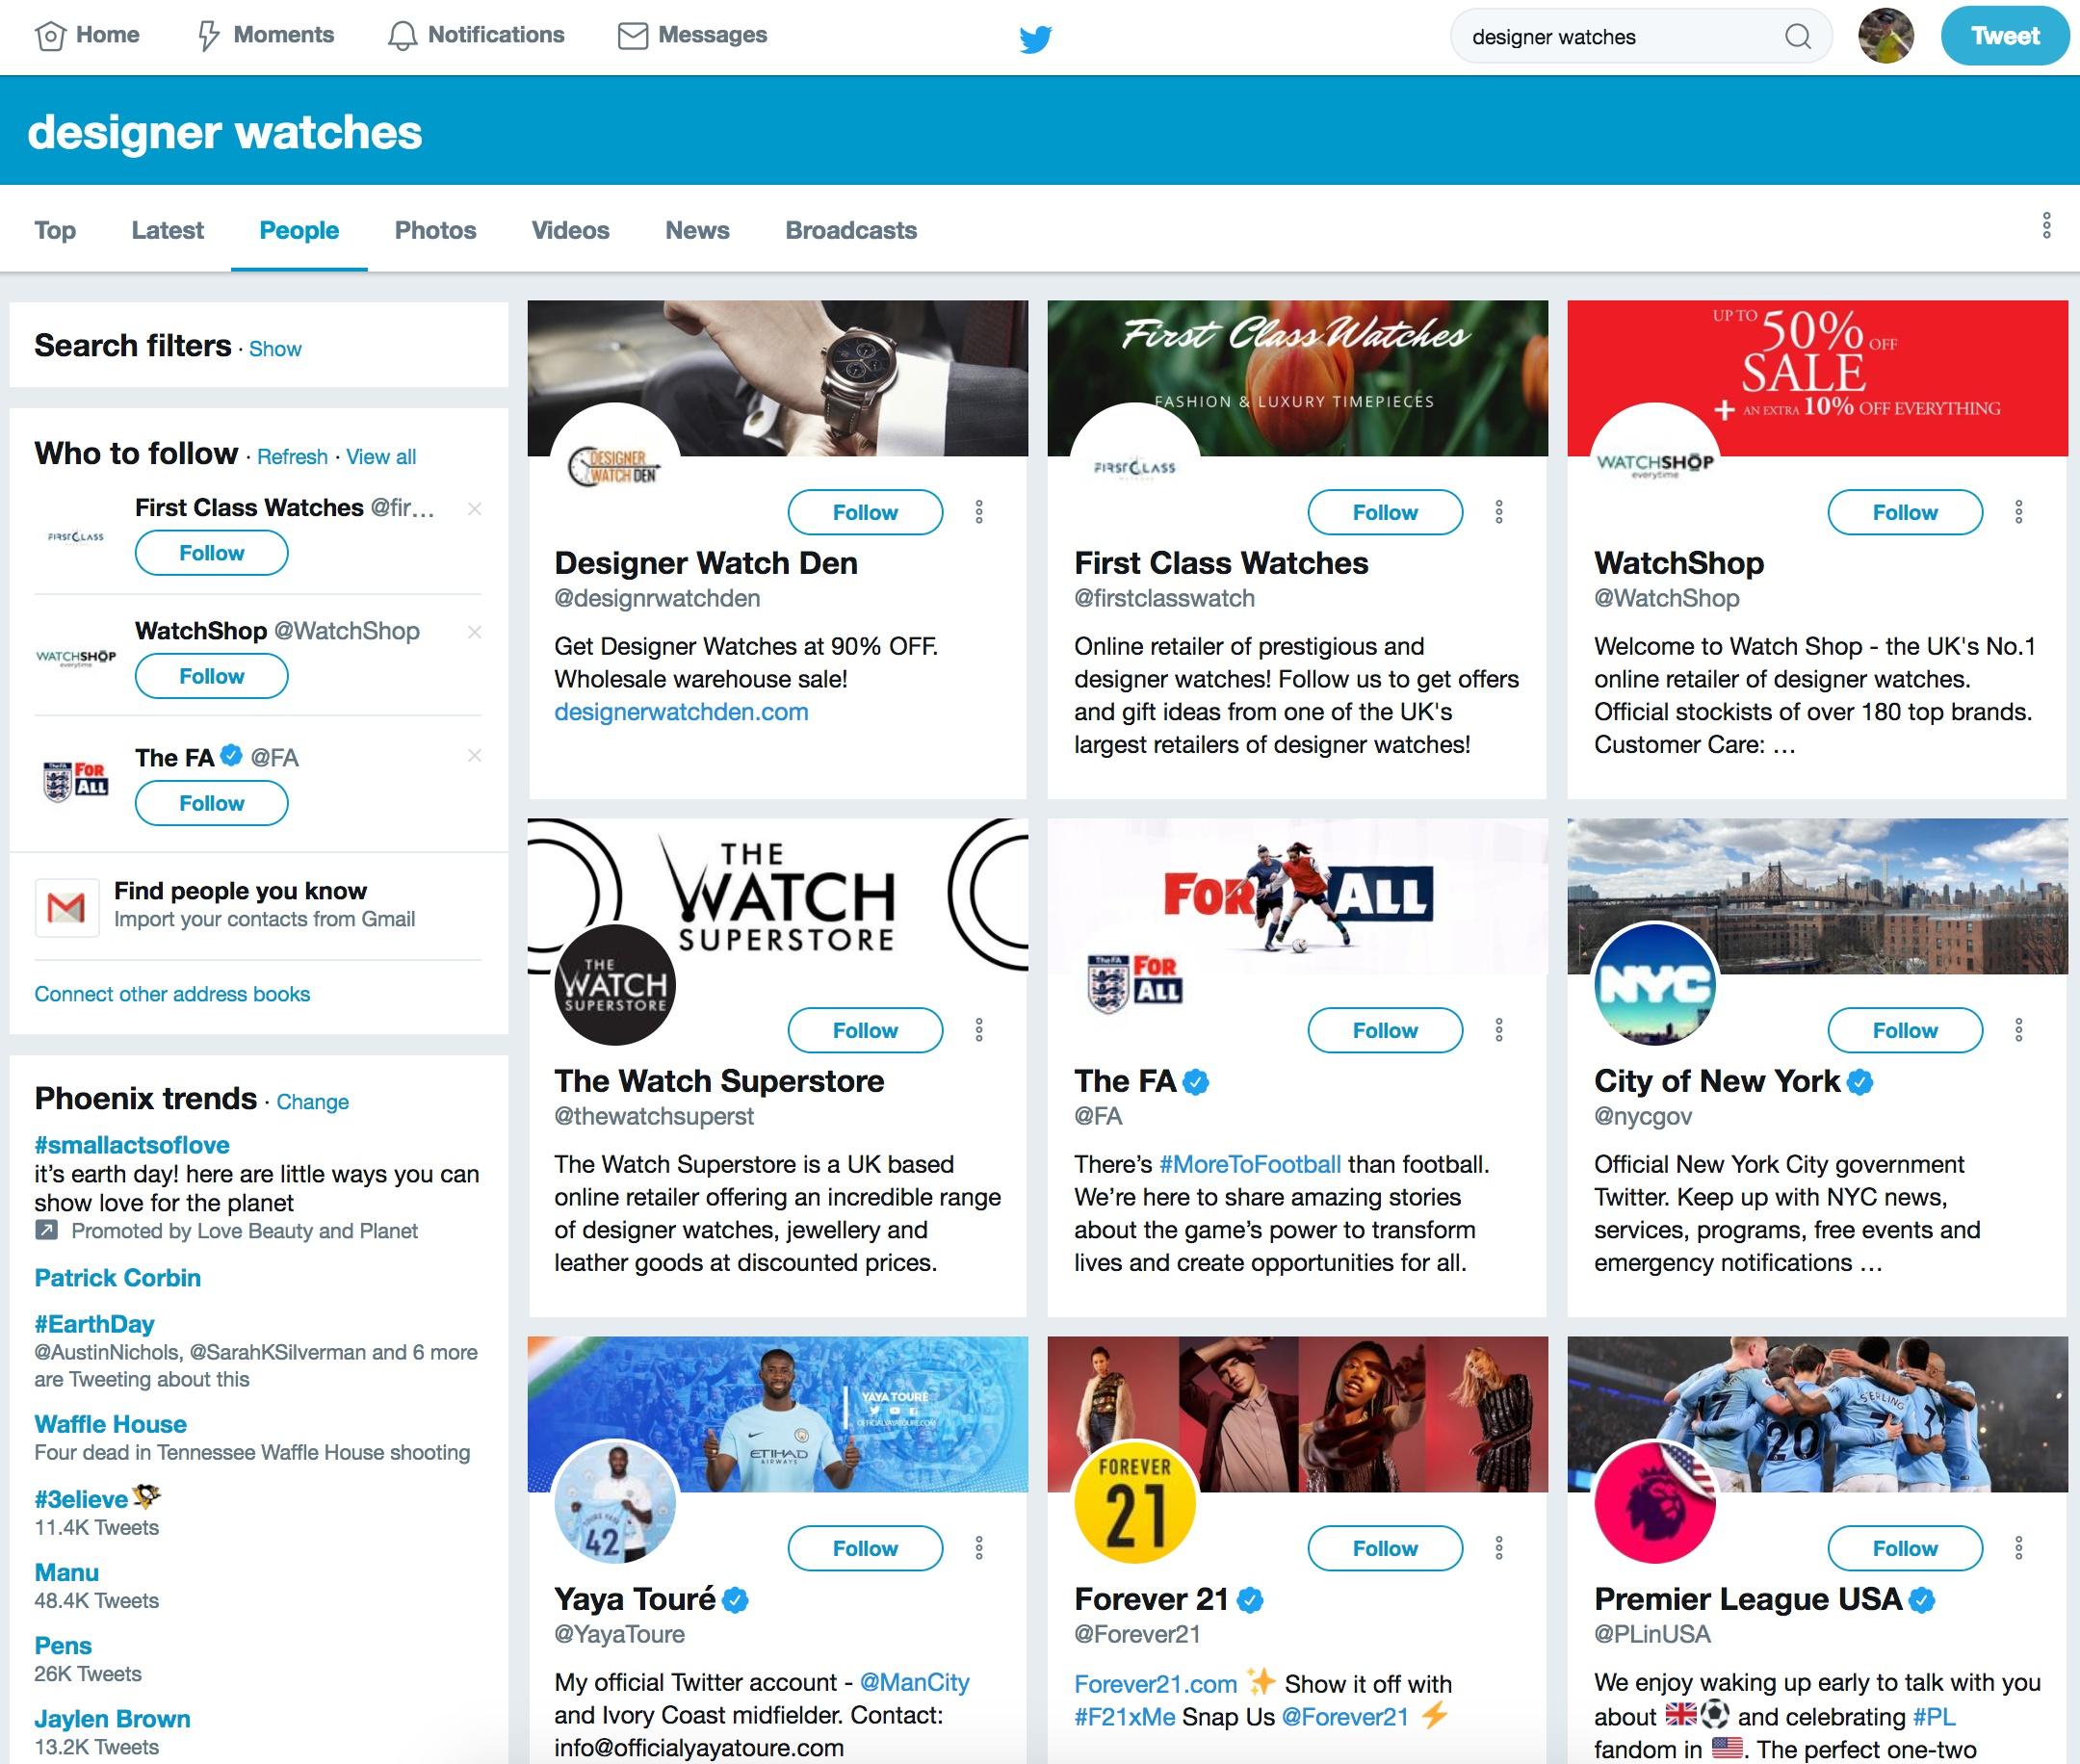 designer watches - increase twitter followers